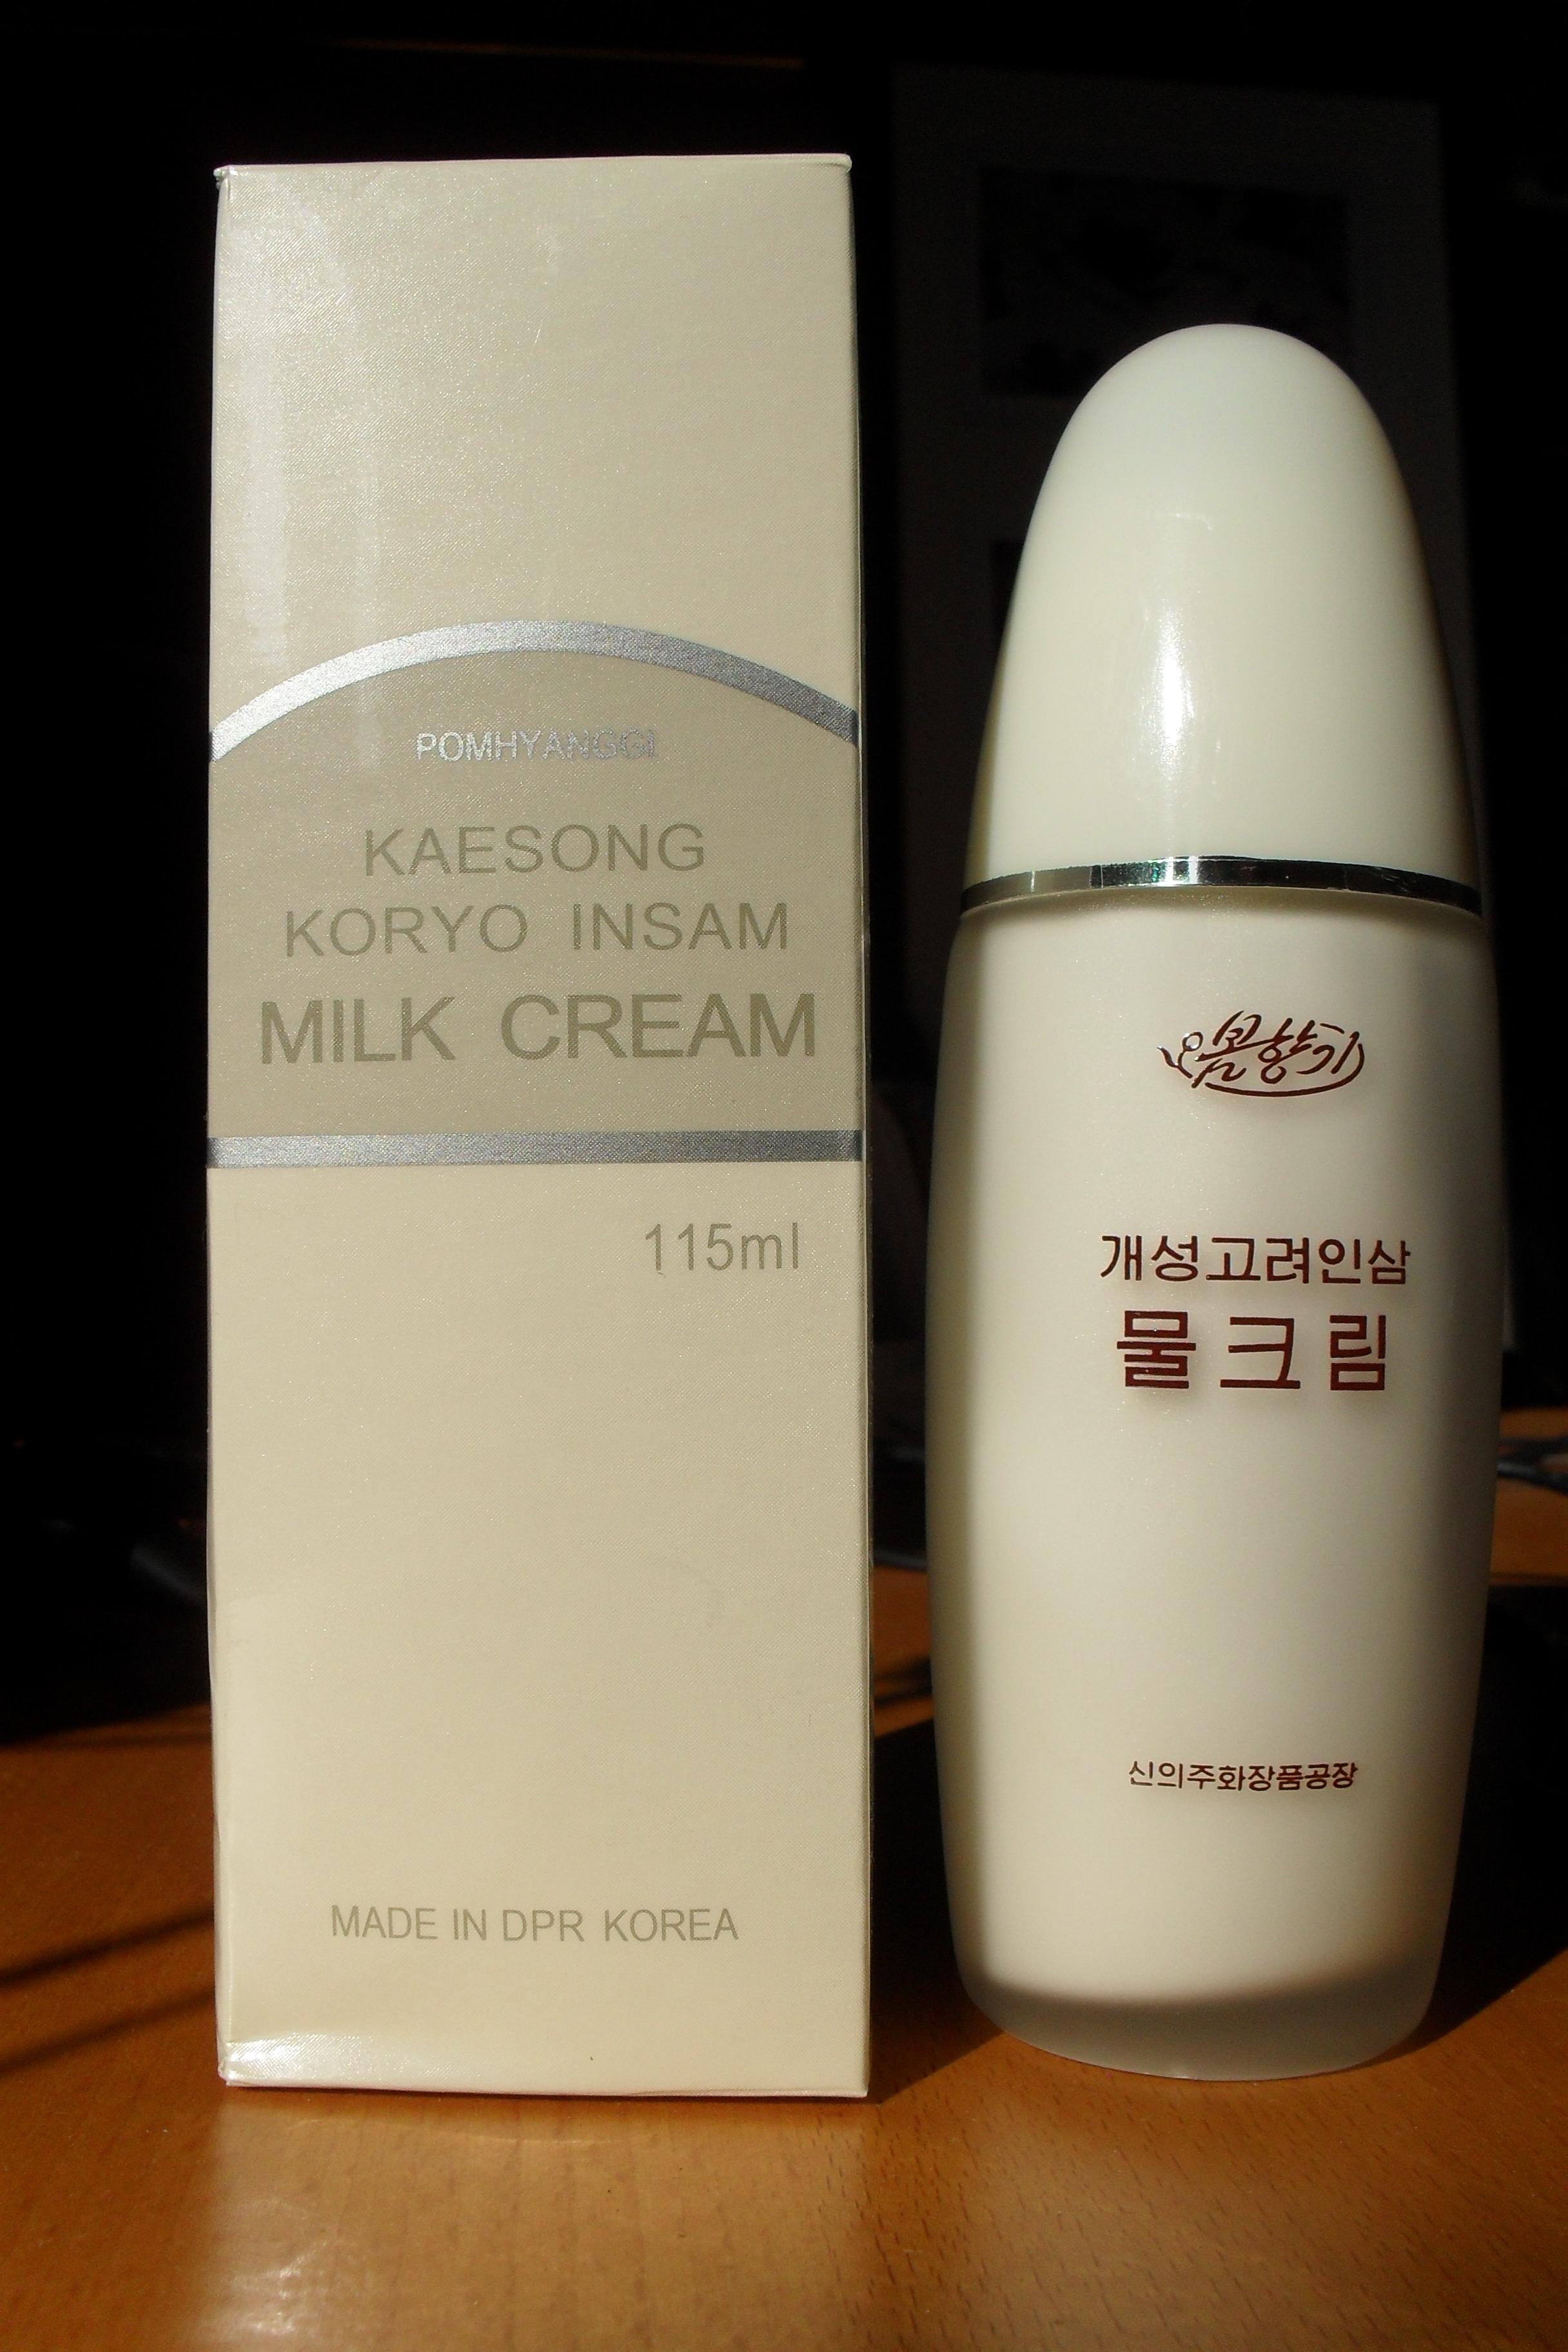 Ginseng hand cream from North Korea